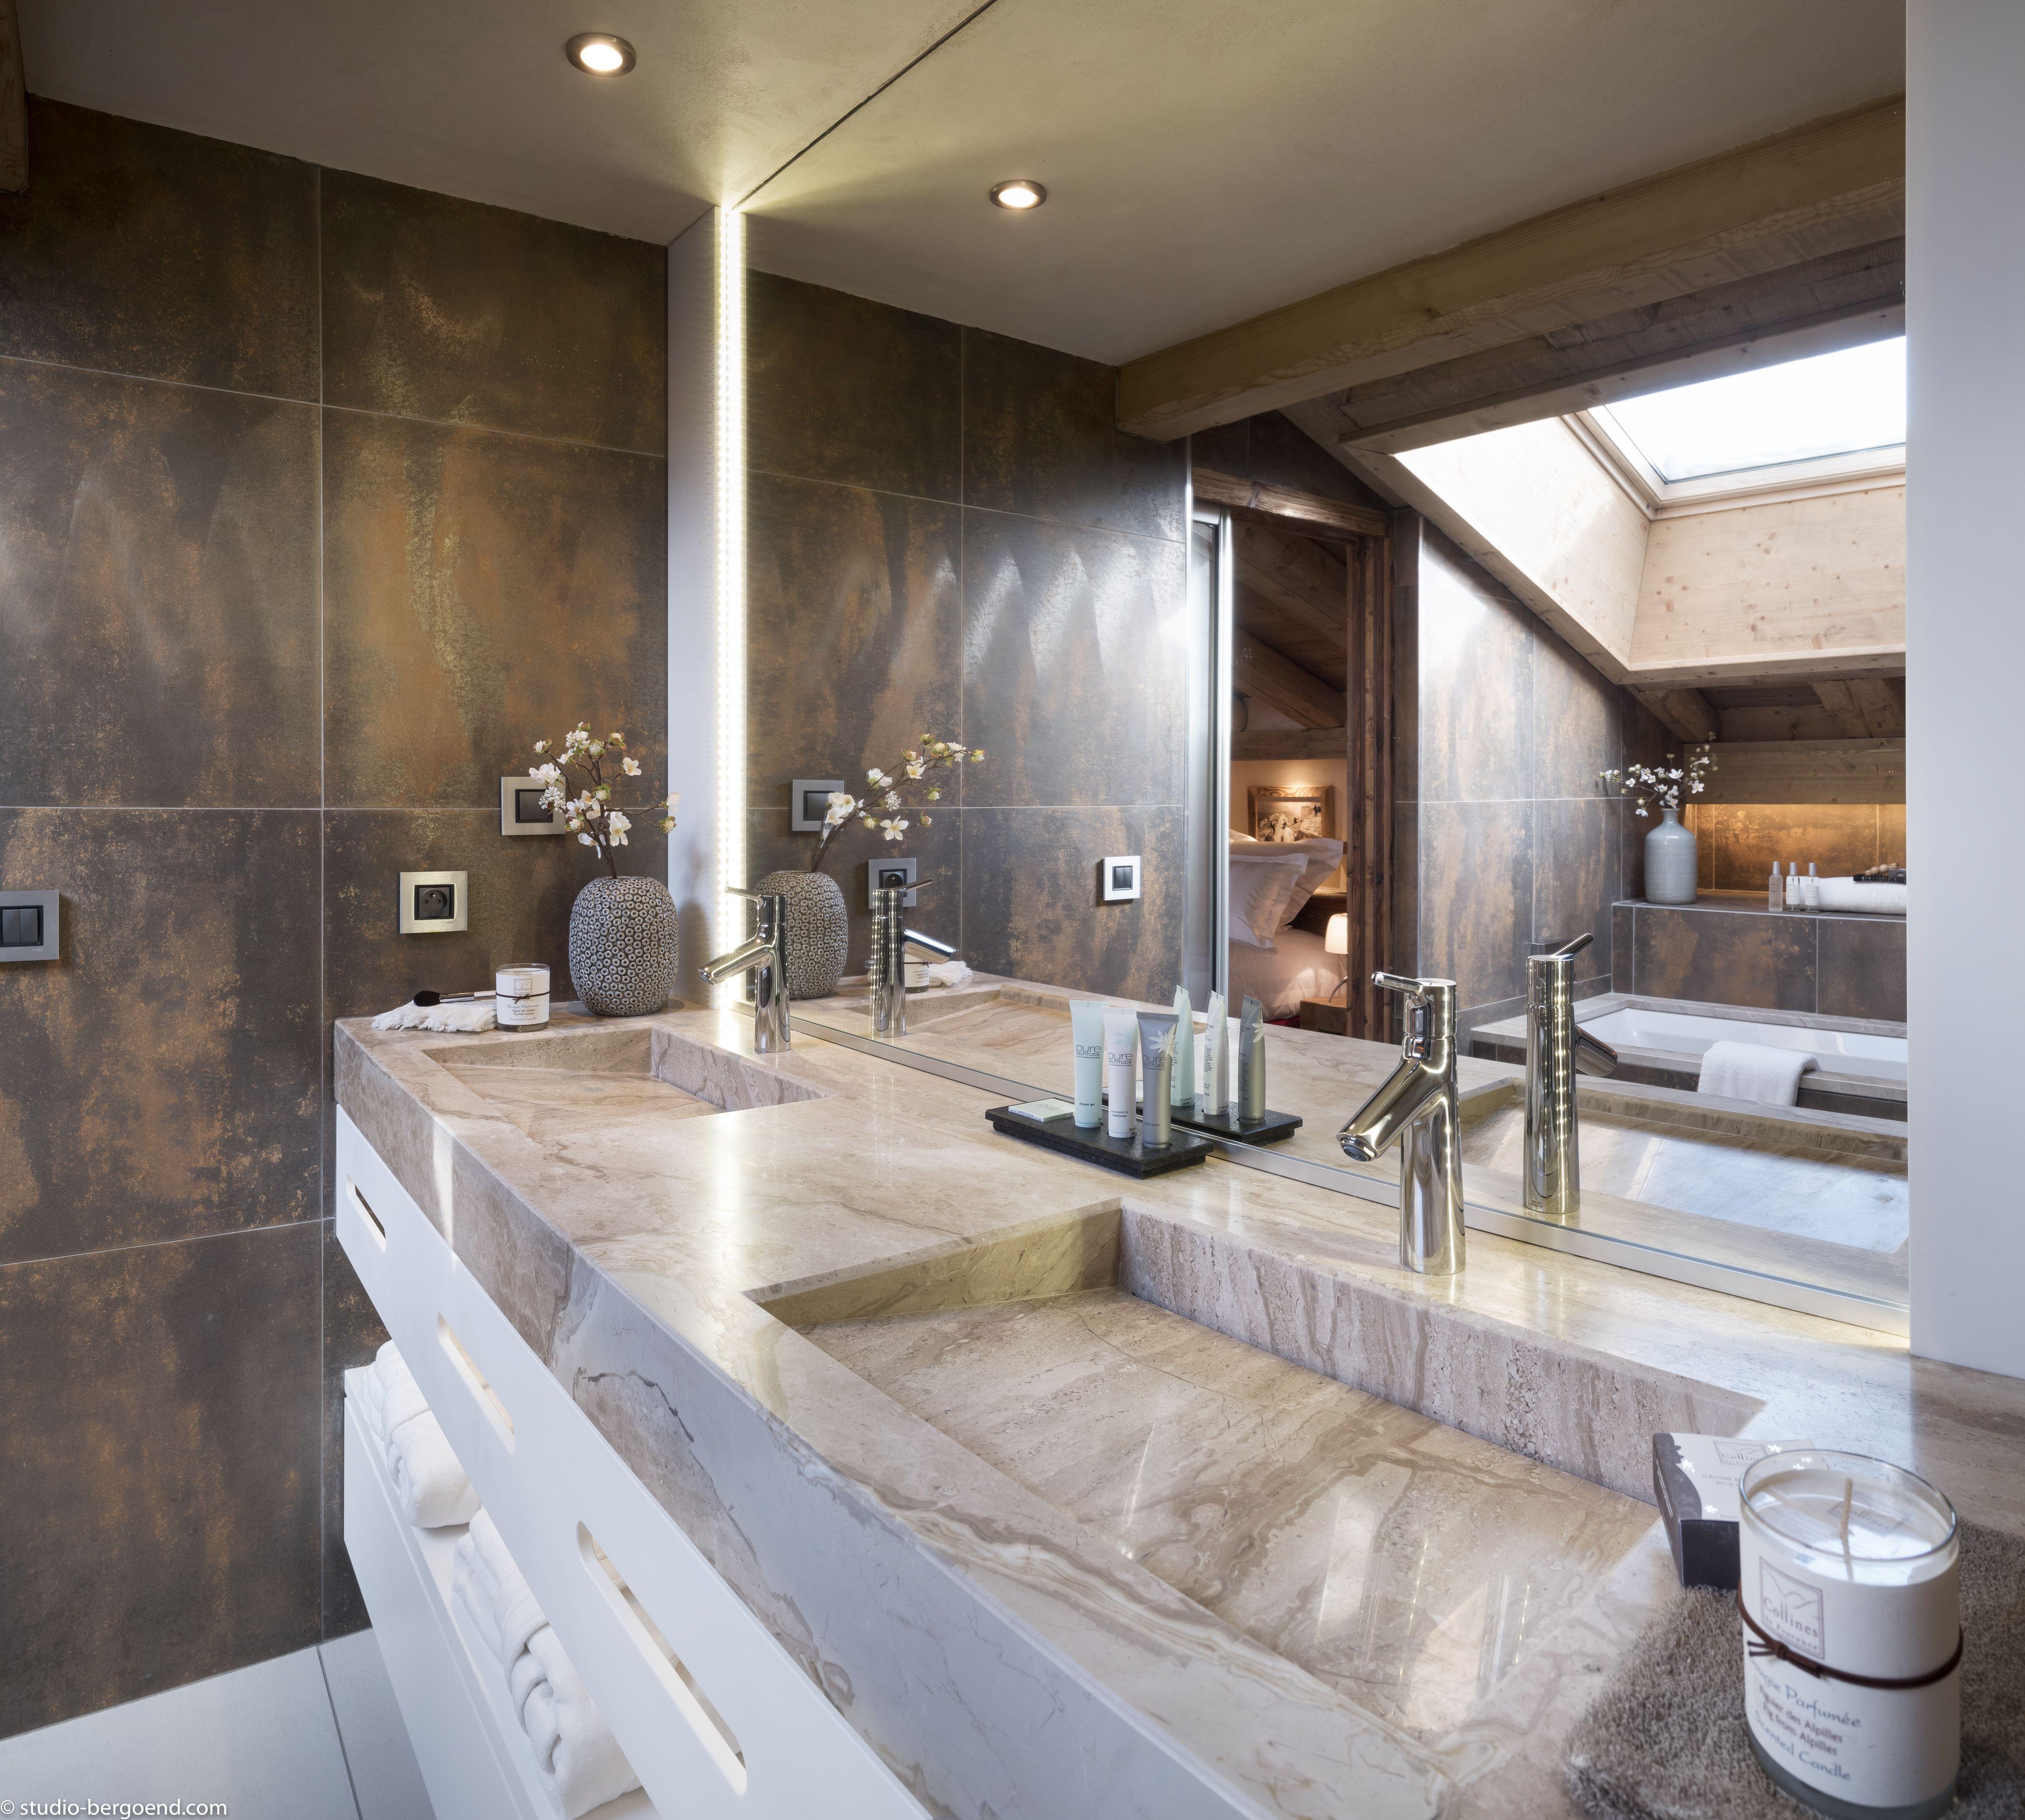 Luxueuse Salle De Bains Avec Tres Grand Miroir Double